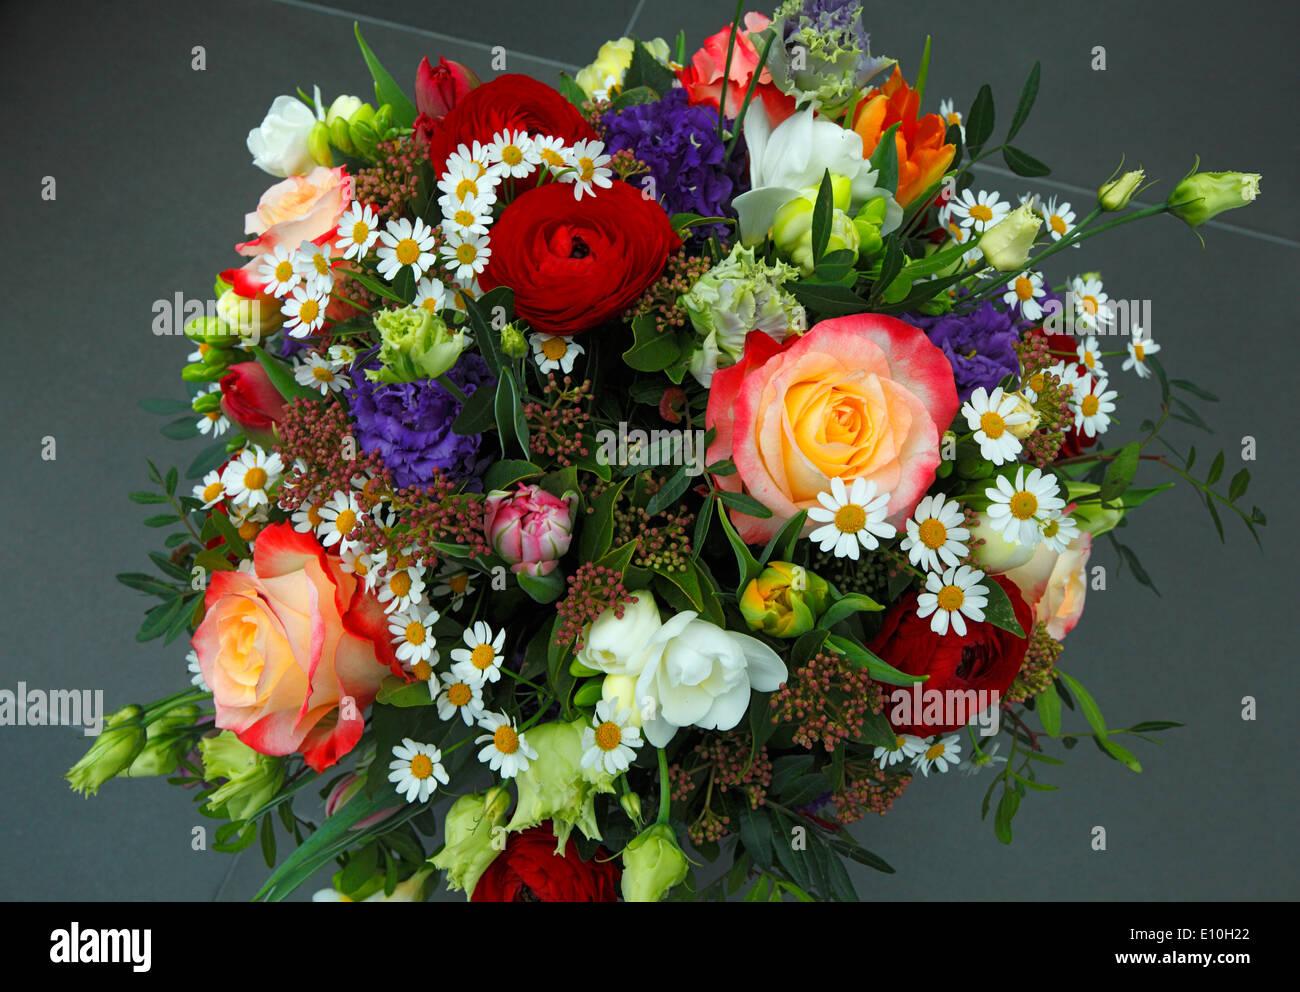 Bunter blumenstrauss mit rosen tulpen freesien for Bouquet de fleurs nature